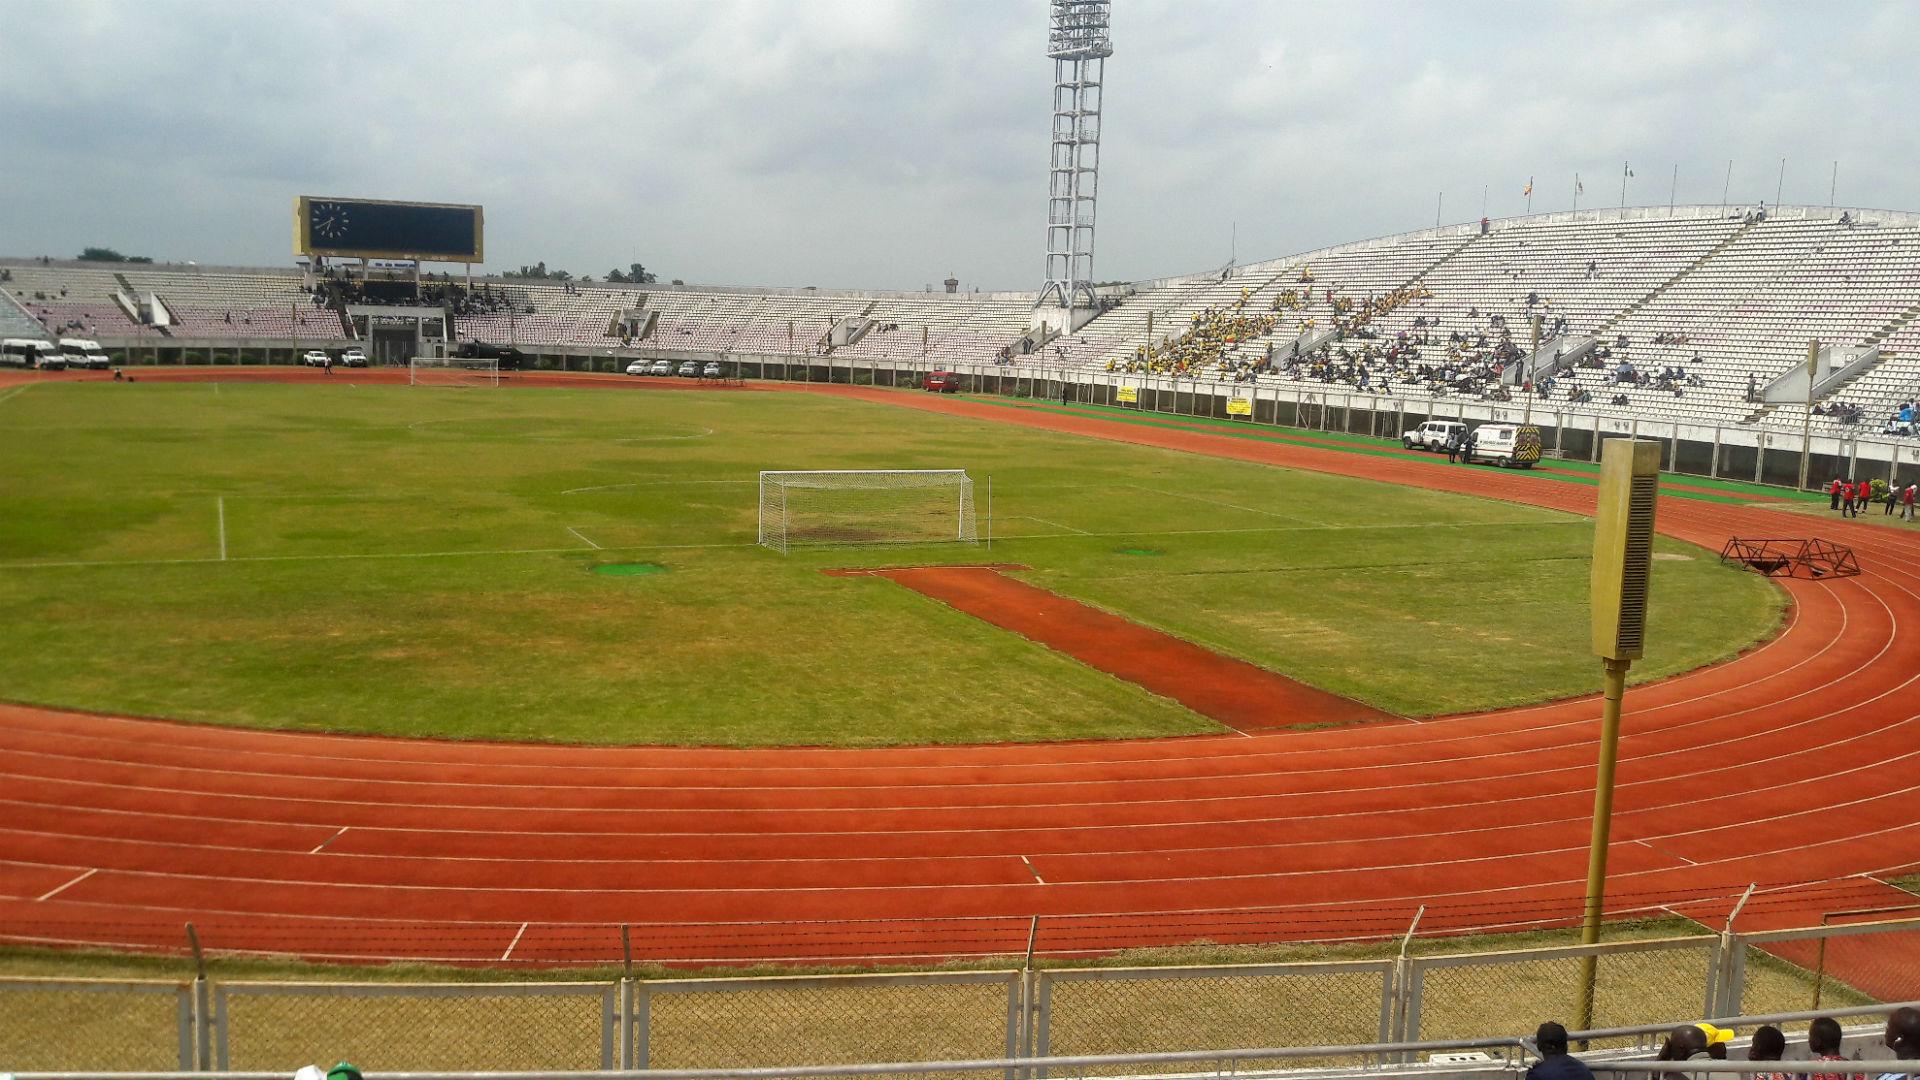 Stade de l'Amitie, Cotonou